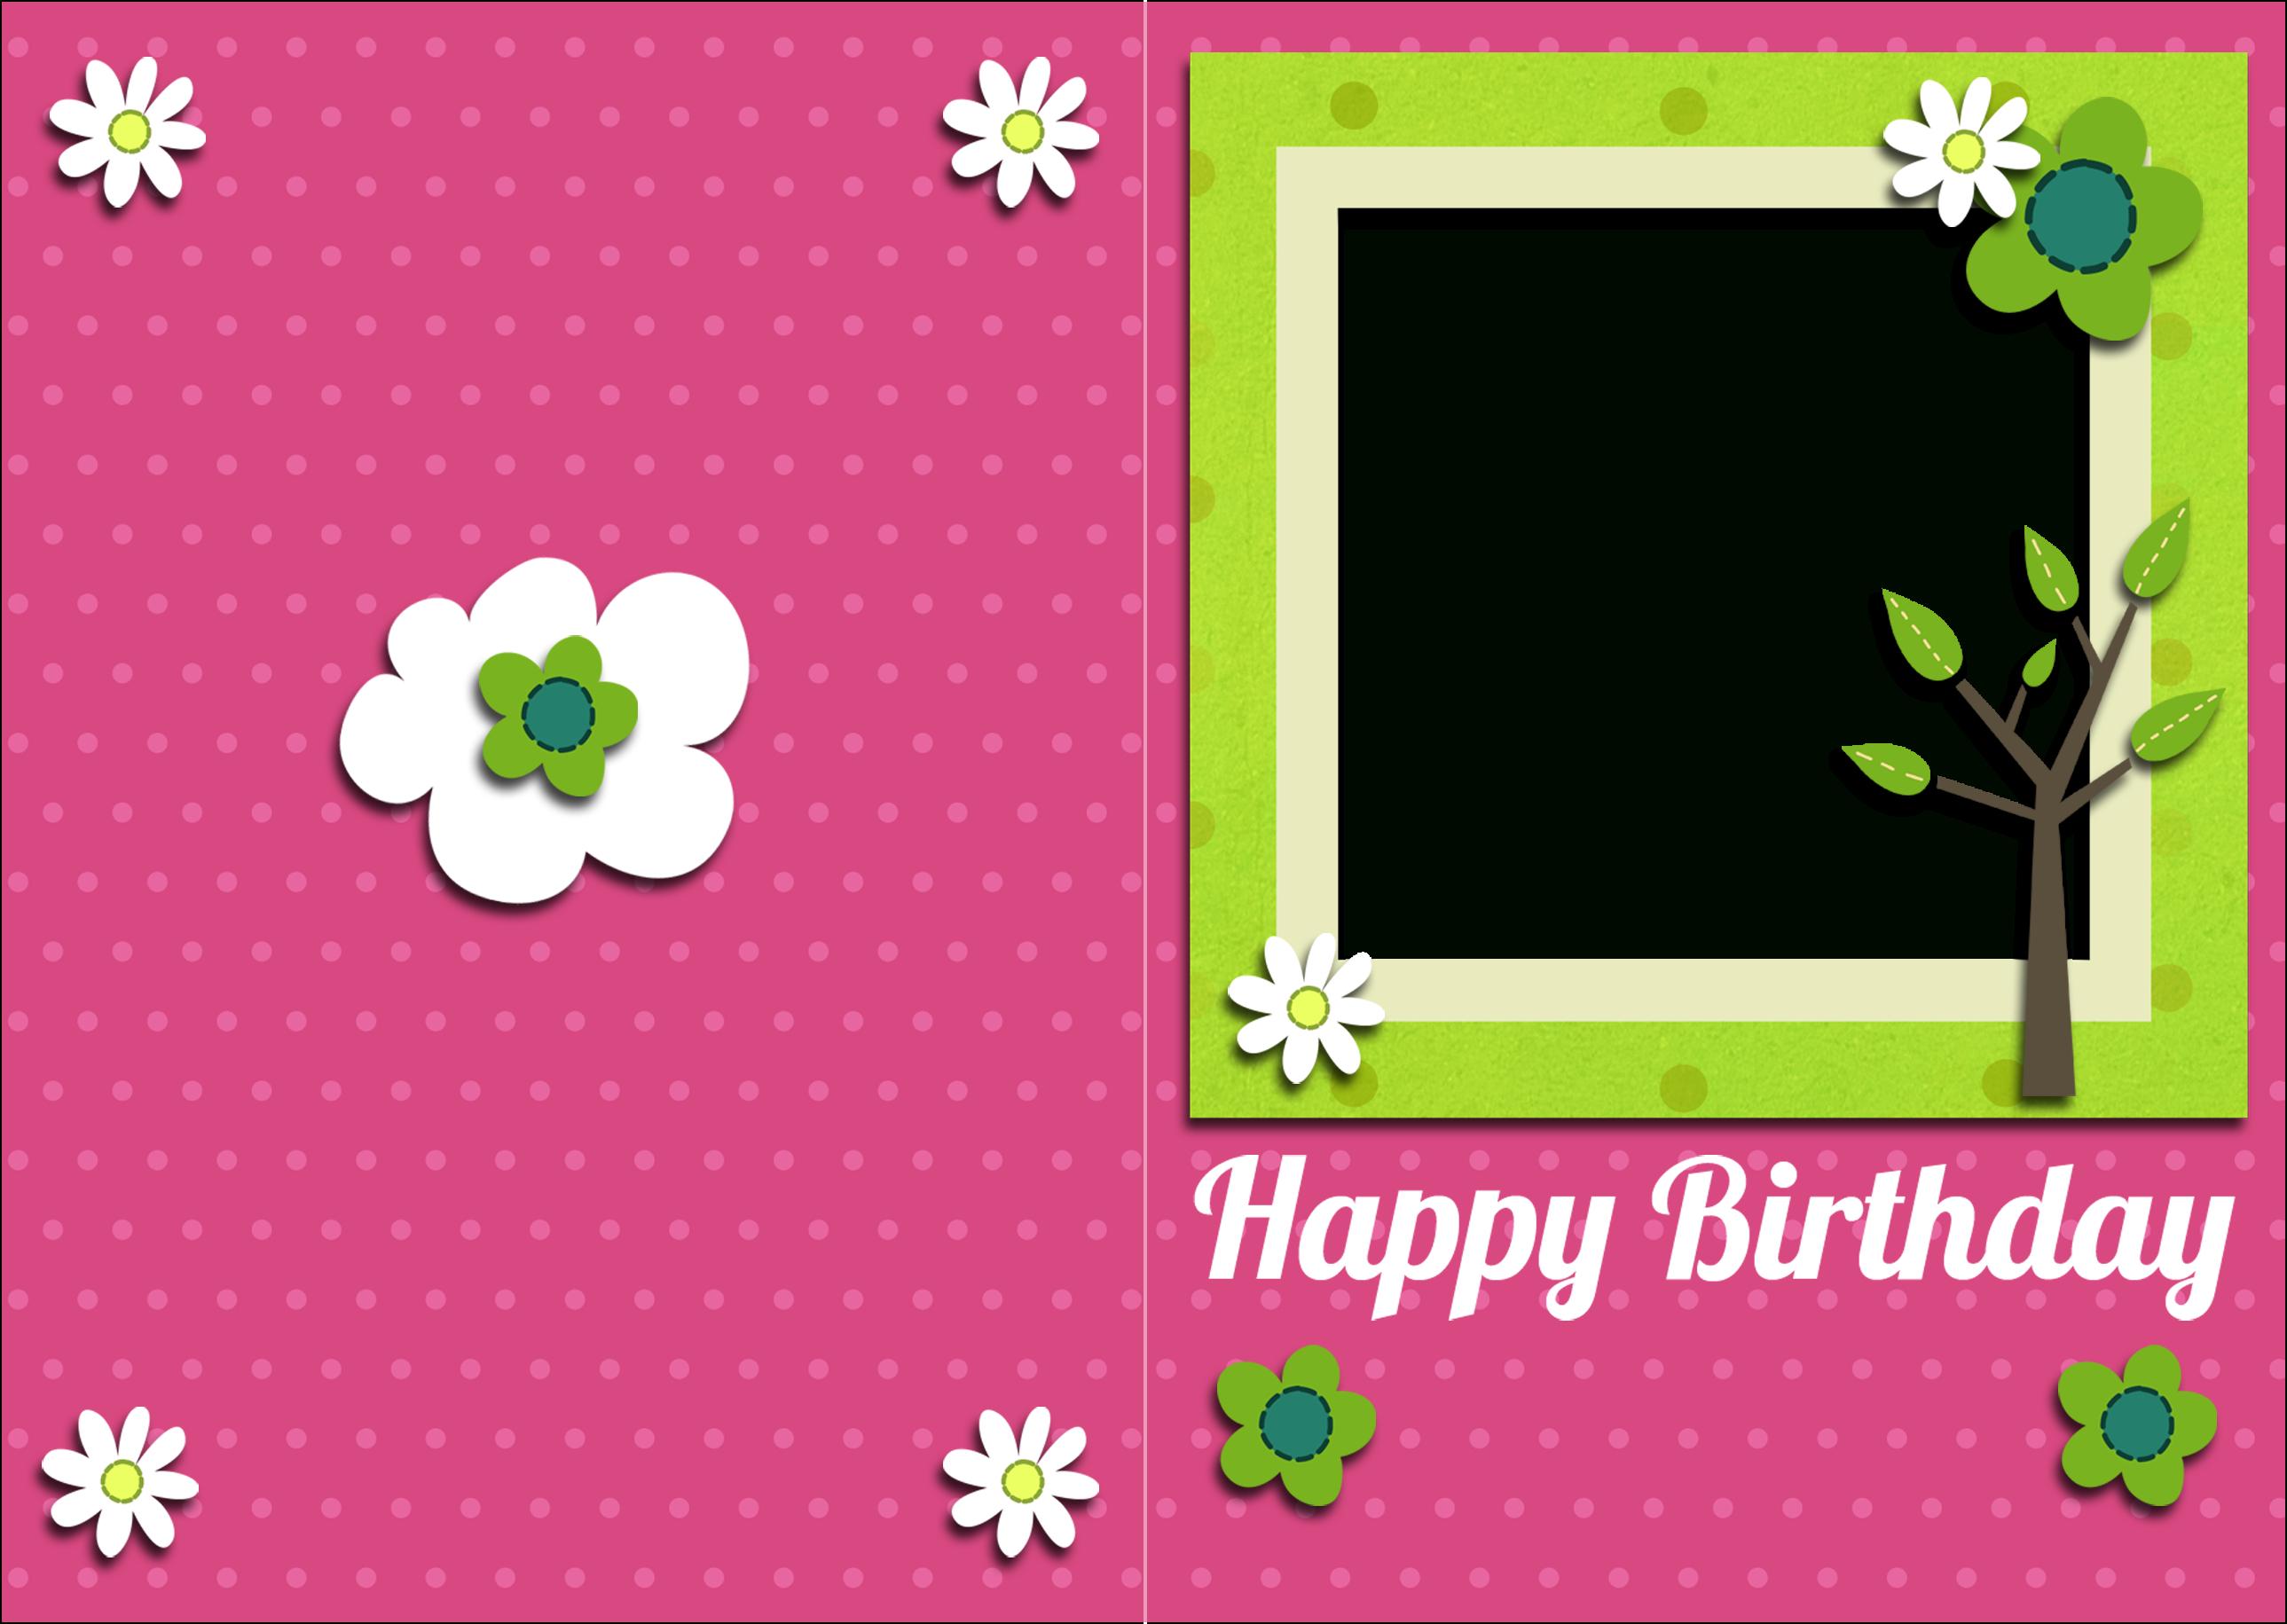 Printable Birthday Cards Hd Wallpapers Download Free Printable - Free Online Printable Birthday Cards